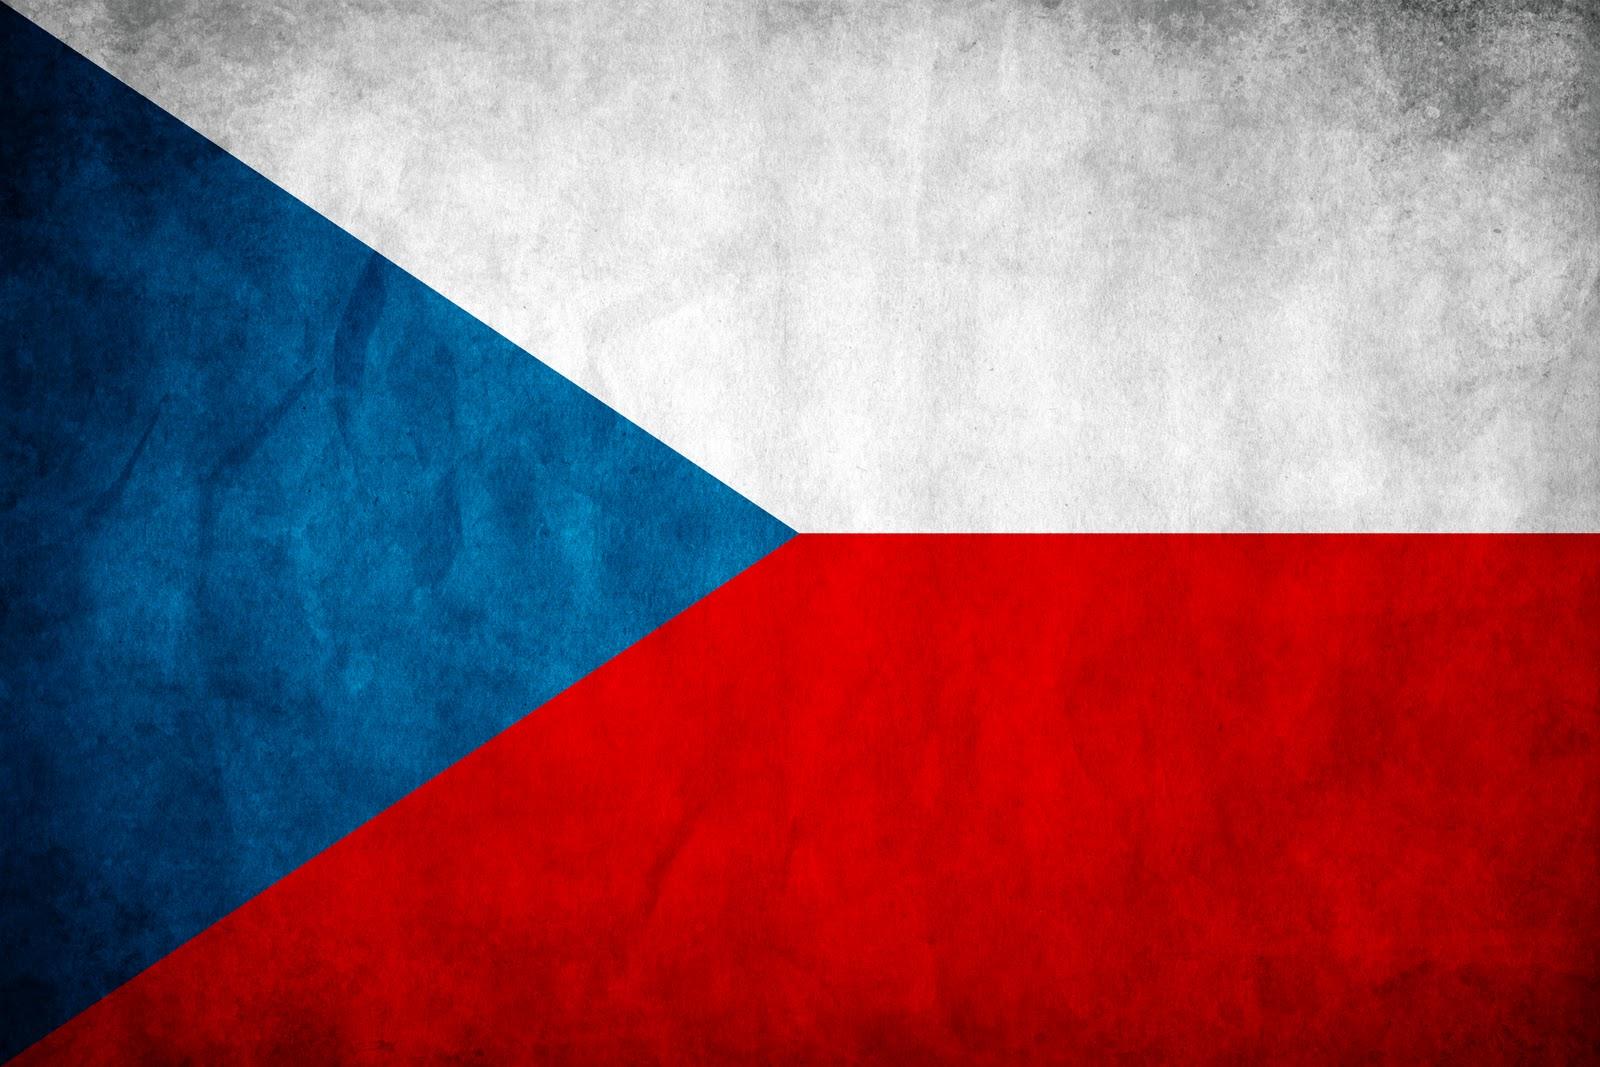 http://3.bp.blogspot.com/-uxHbkHW4CJw/TvPir3Q03fI/AAAAAAAAFsA/pH0KsxkXtFI/s1600/bandera+republica+checa.jpg